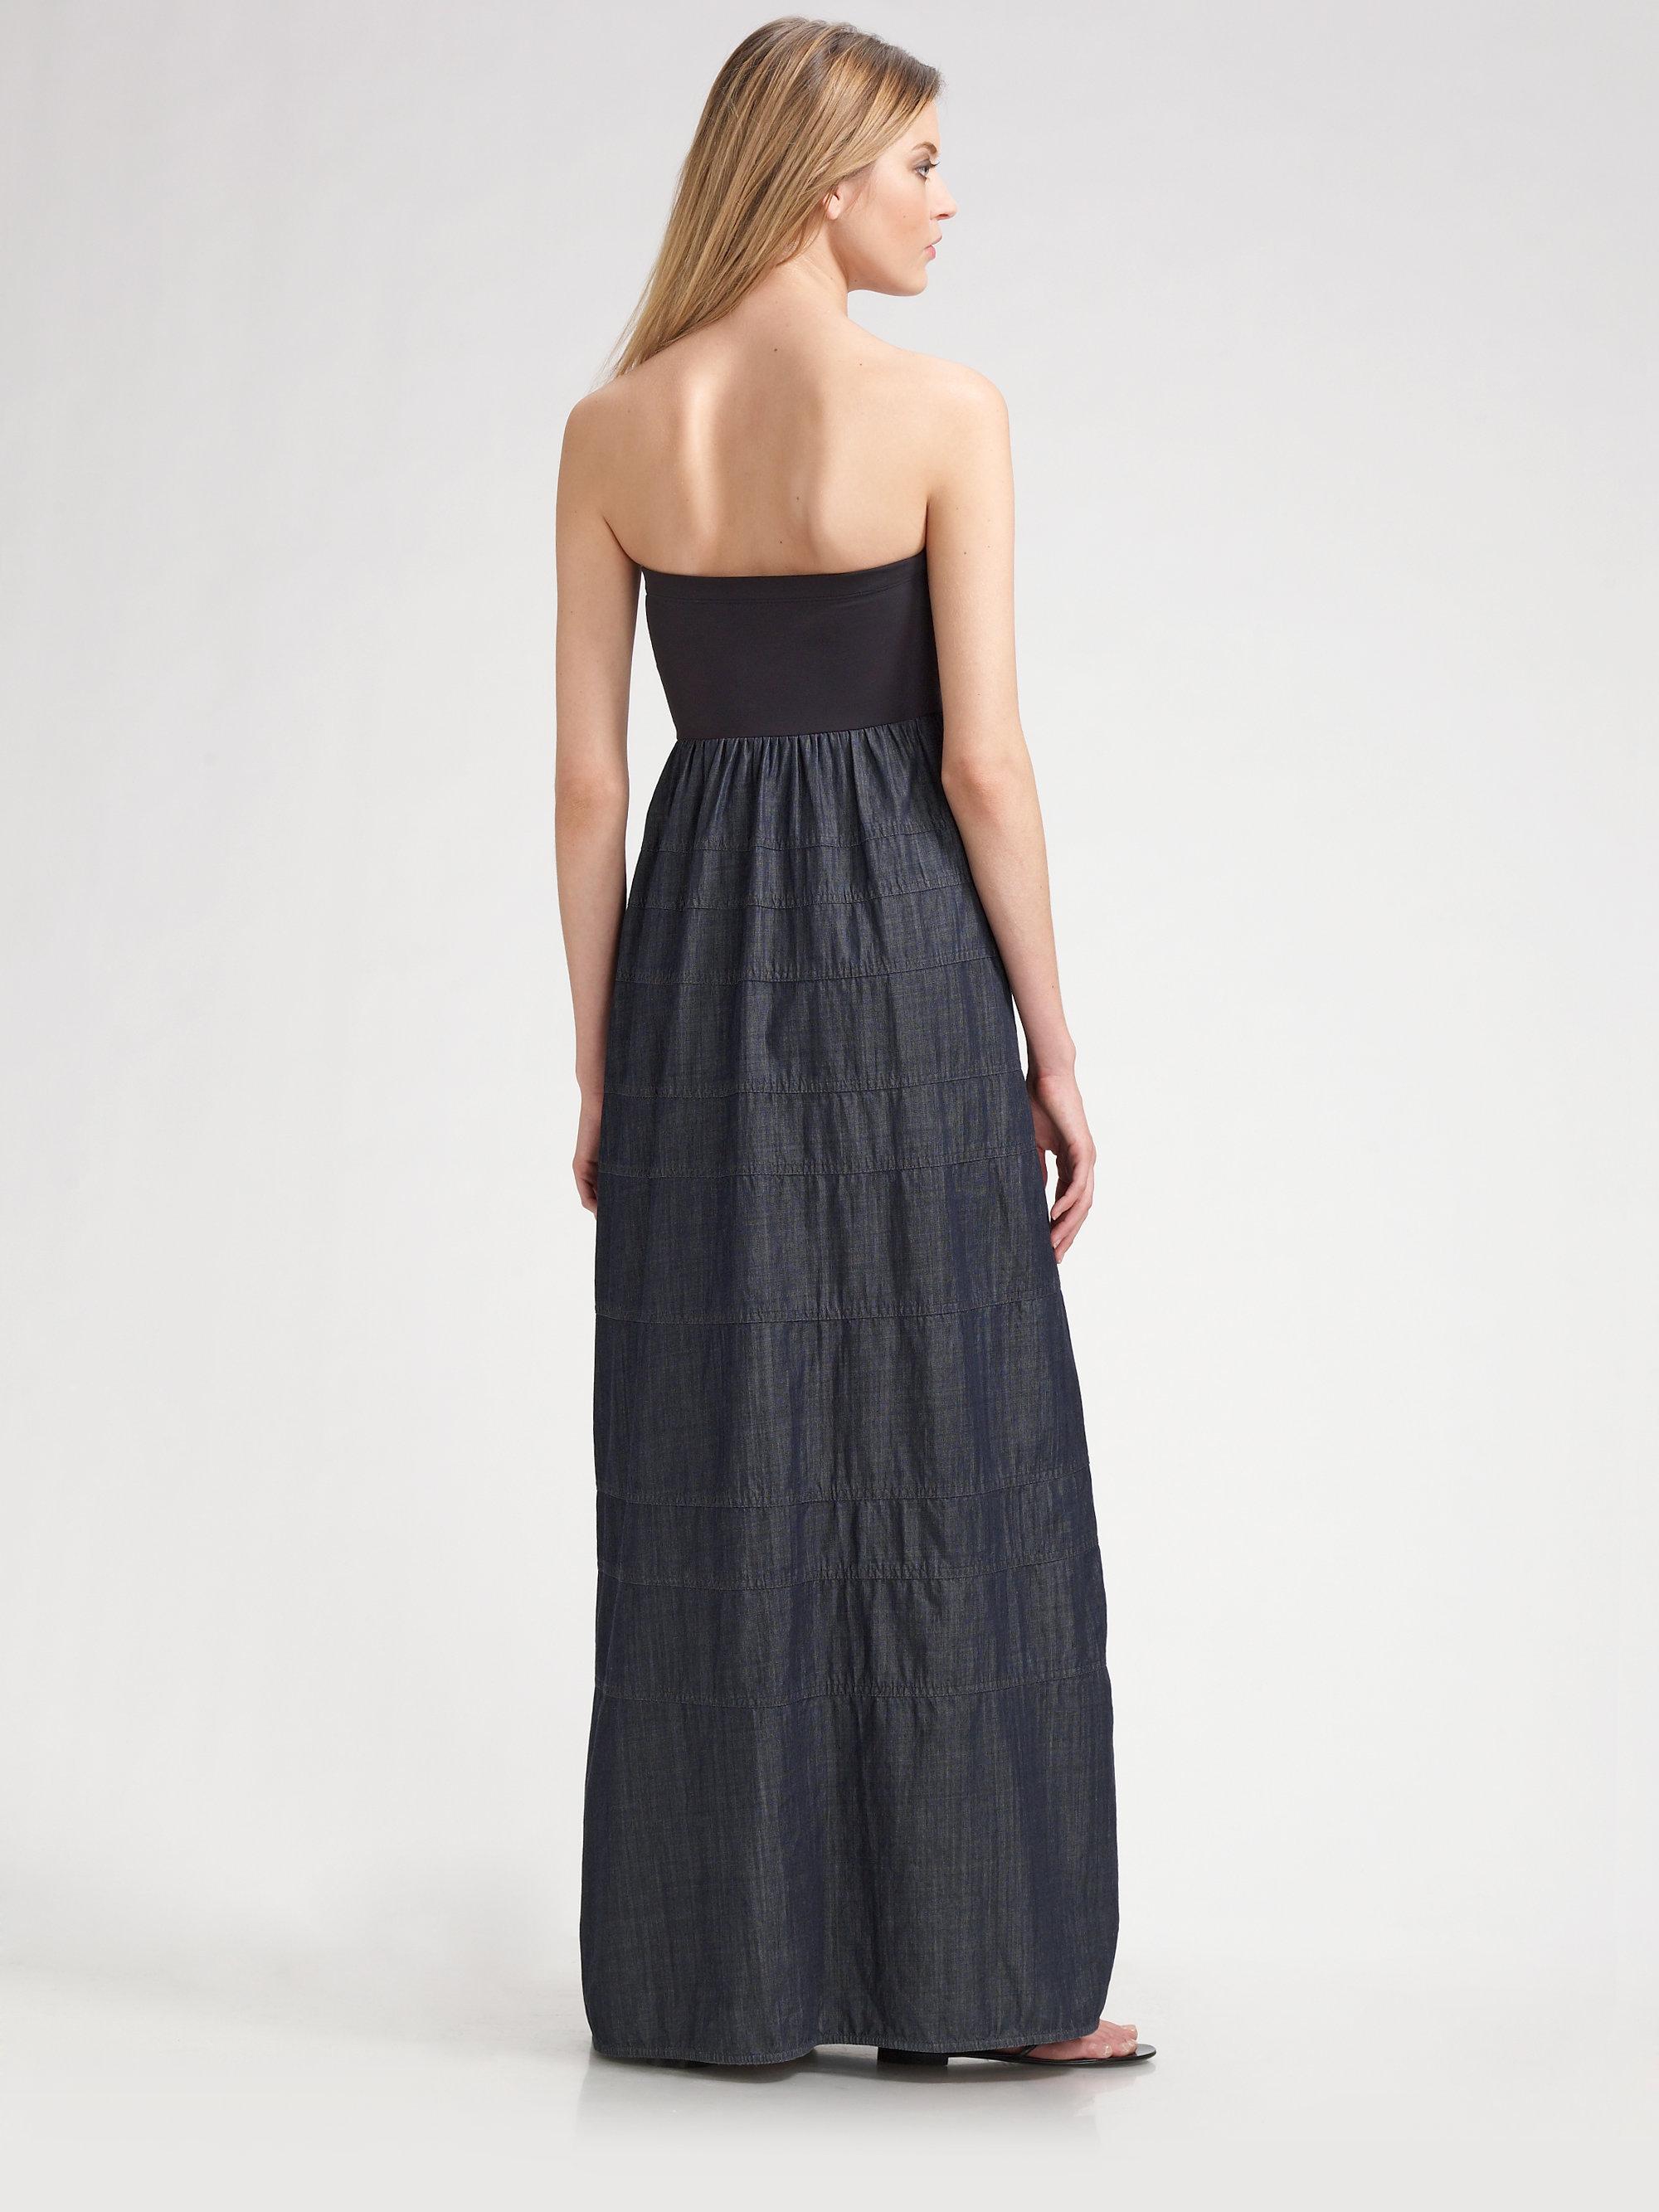 Theory Keegan Strapless Maxi Dress in Gray | Lyst